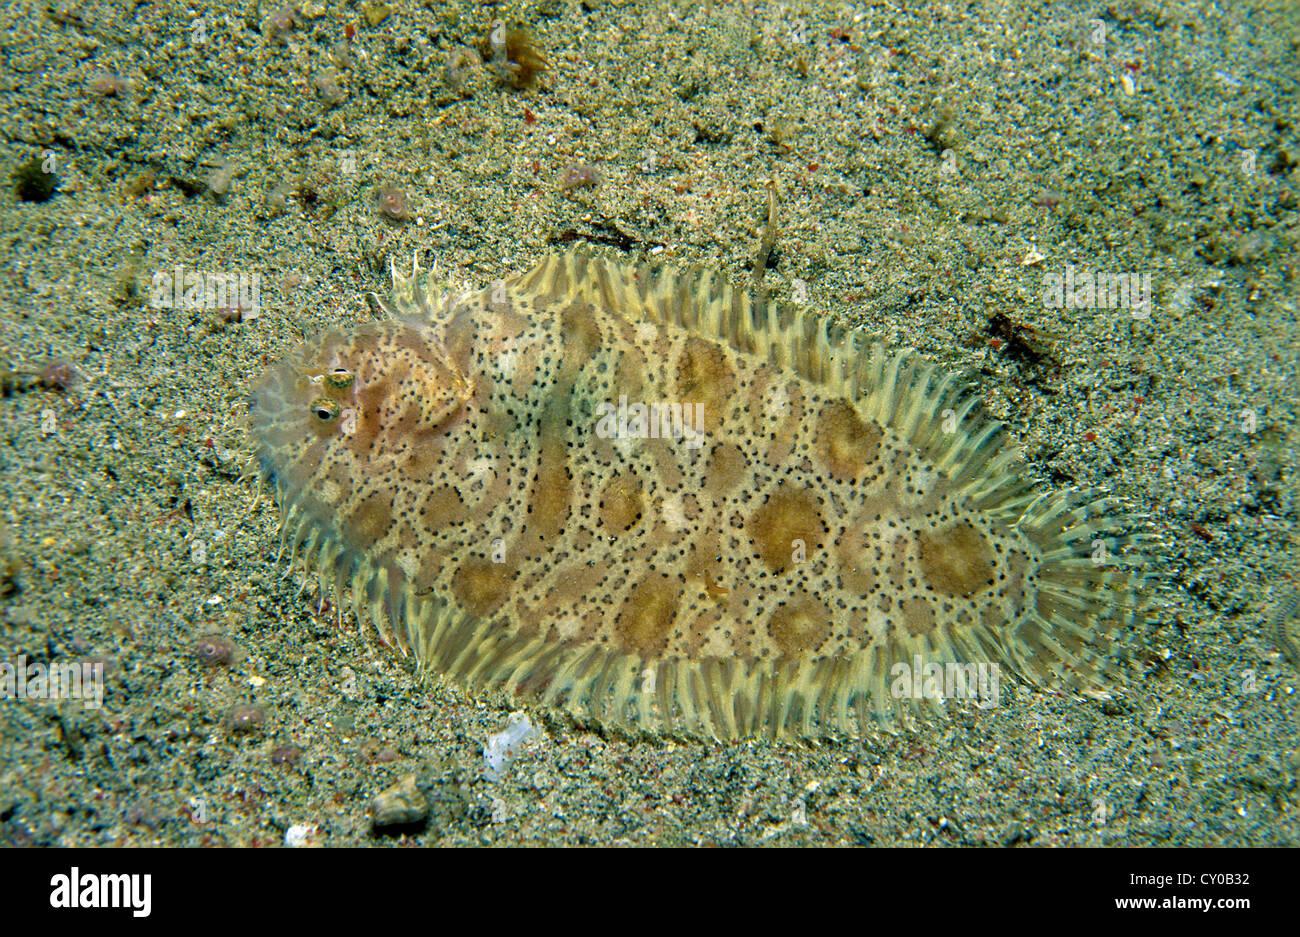 Carpet sole (Liachirus melanospilos), Sabang, Puerto Galera, Oriental Mindoro province, Philippines, Asia - Stock Image